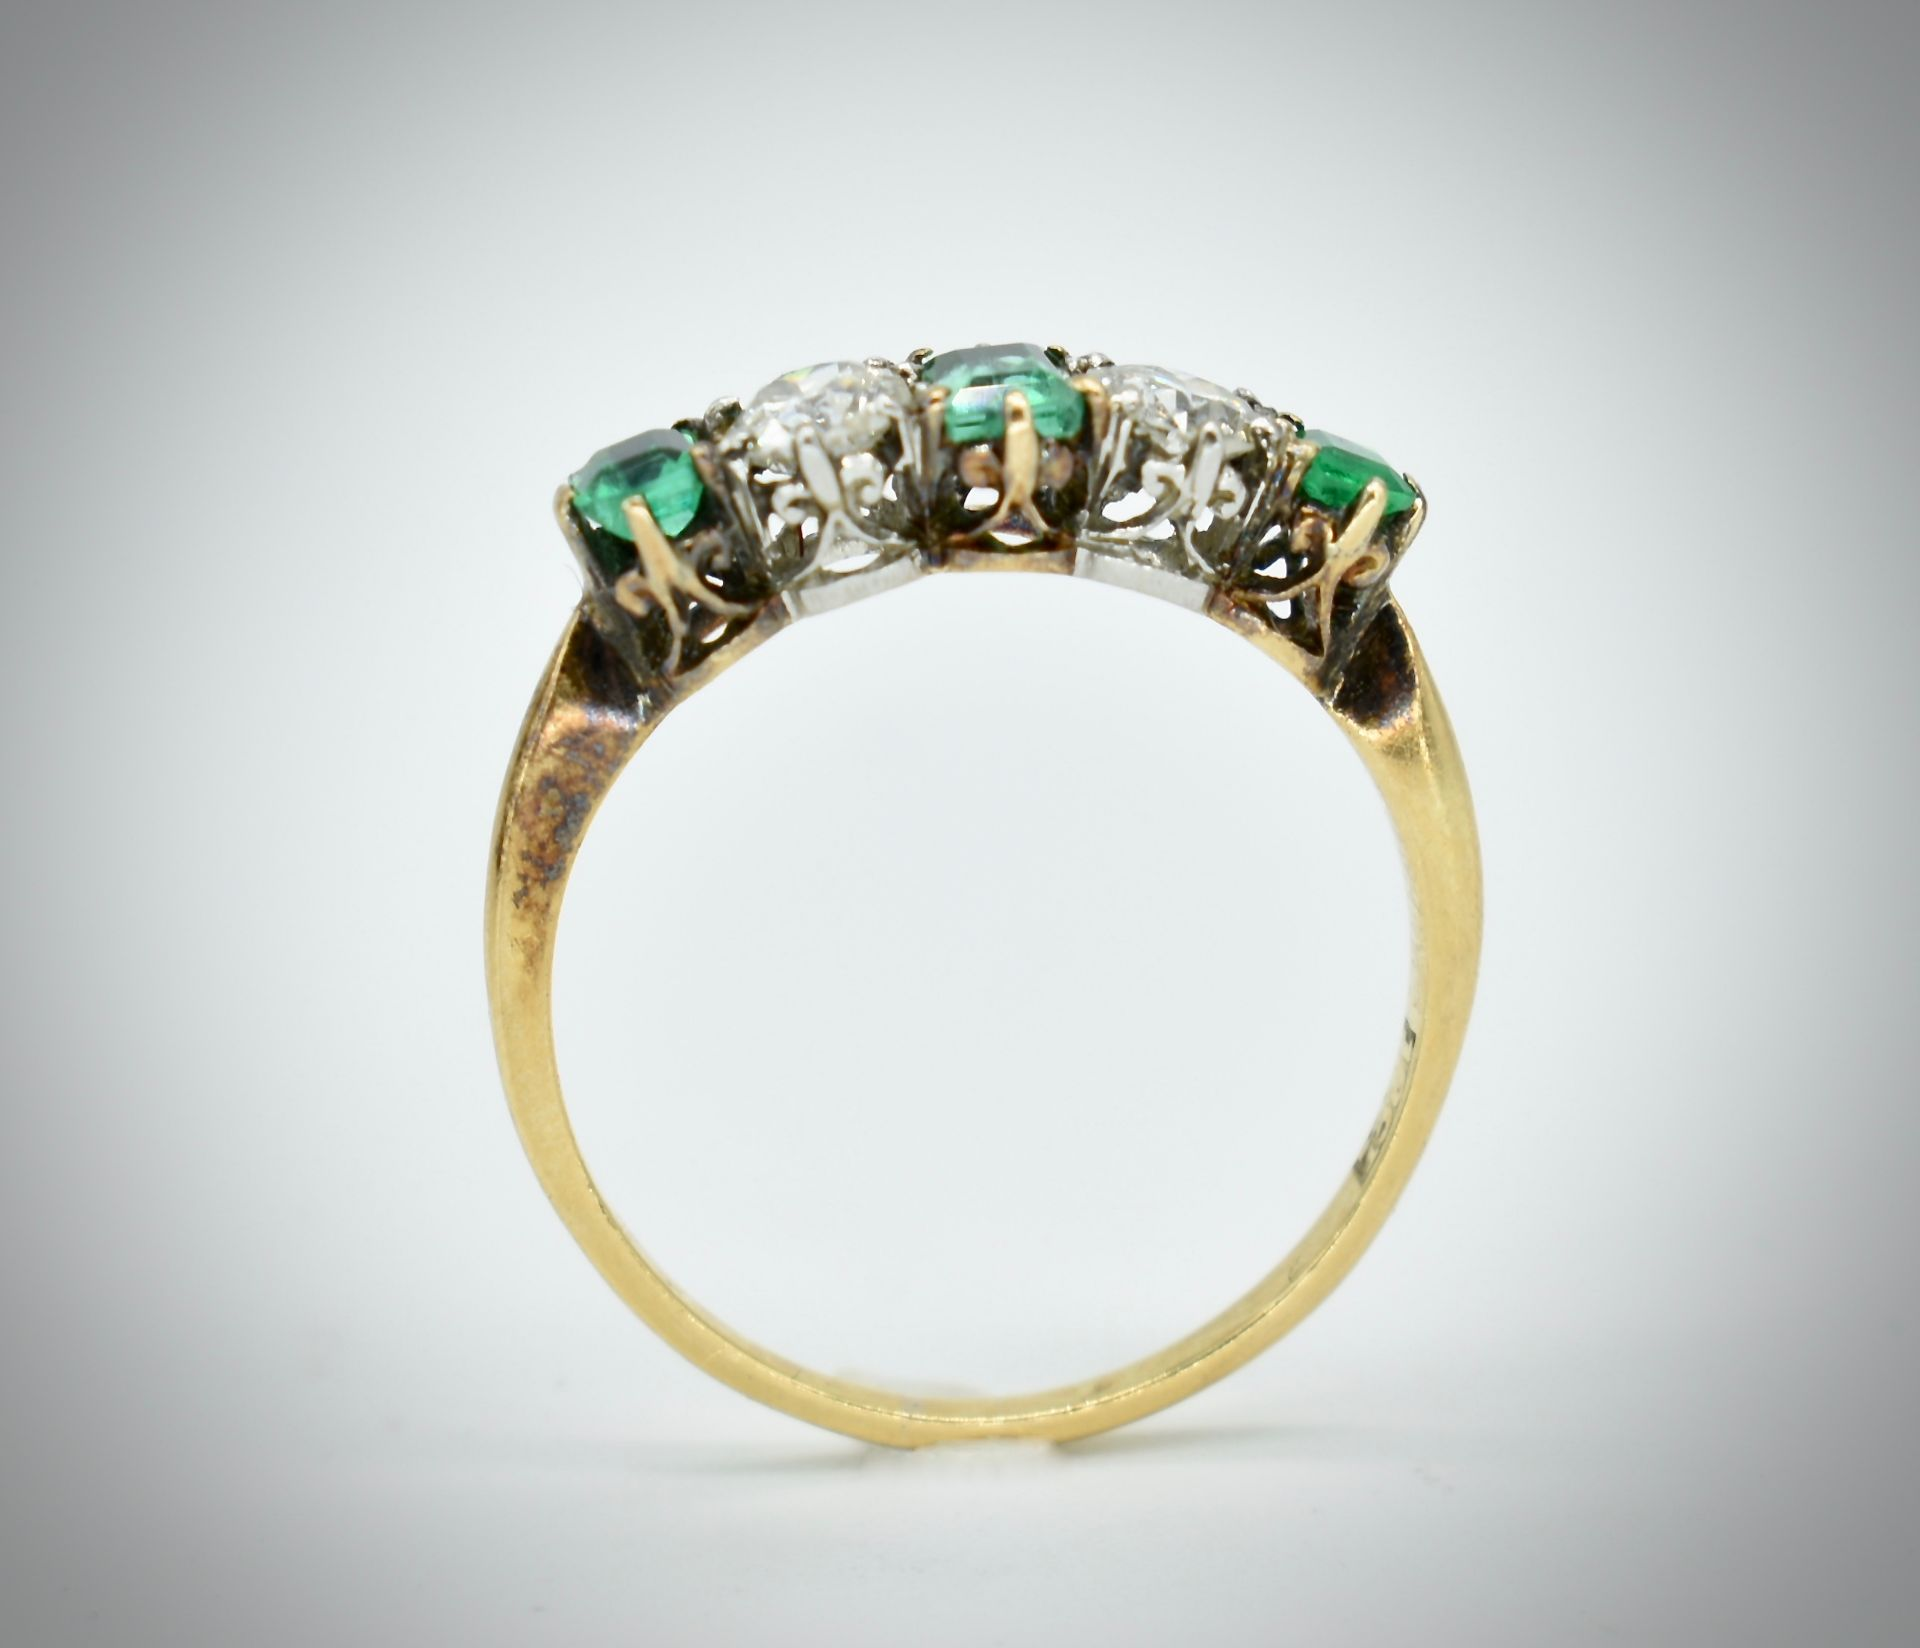 18ct Gold Emerald & Diamond Five Stone Ring - Image 2 of 7